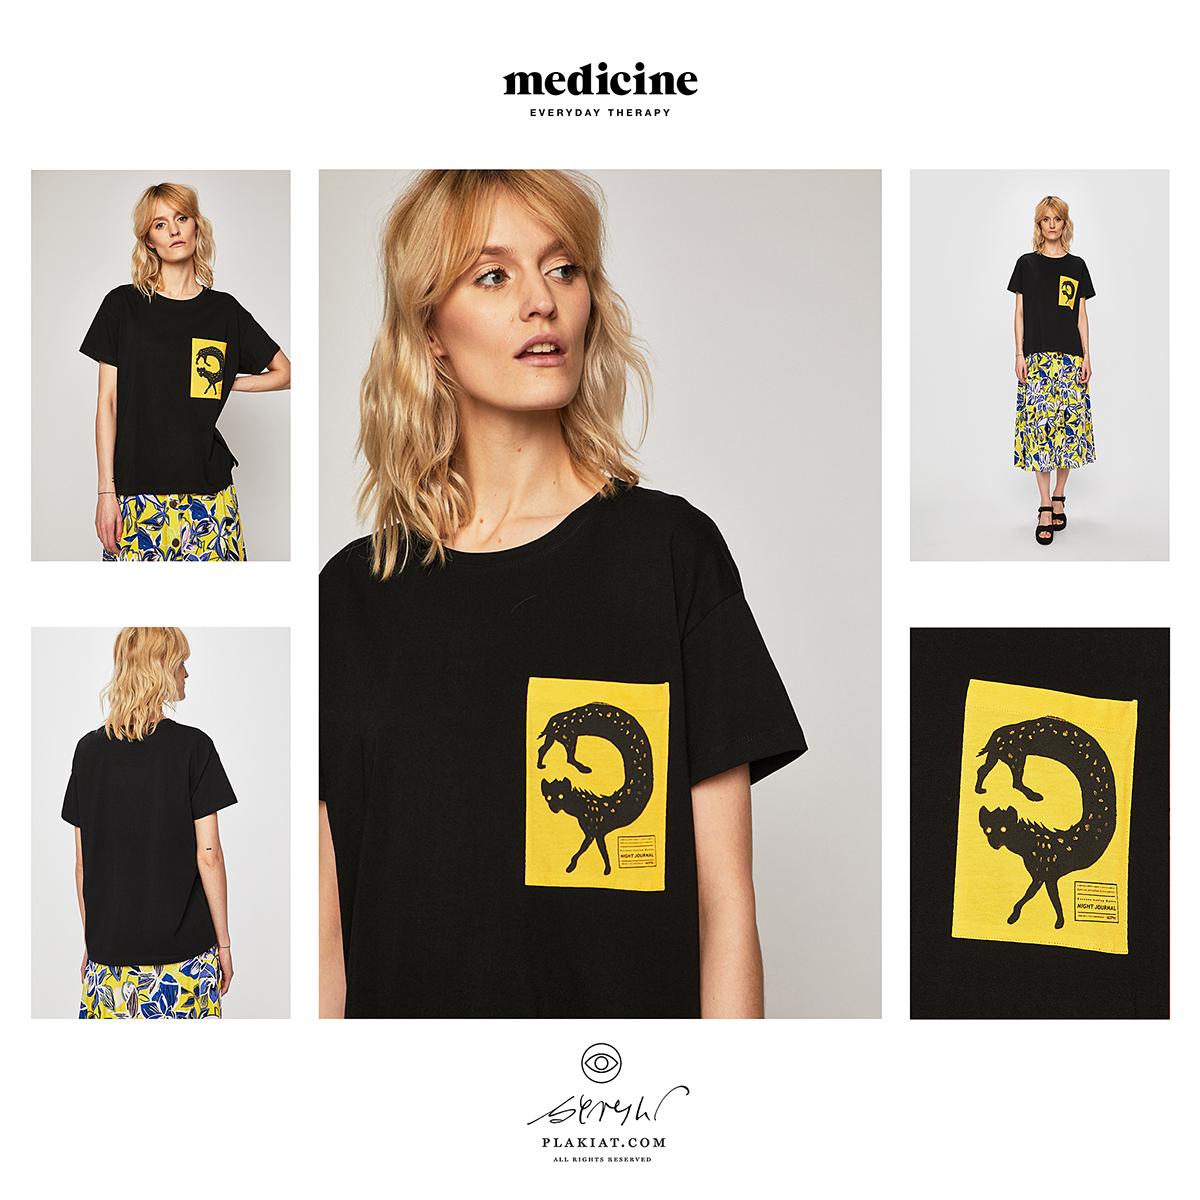 medicine,medicine everyday therapy,Fashion ,moda,zara,vogue,tshirt,tshirts,koszulki,clothes